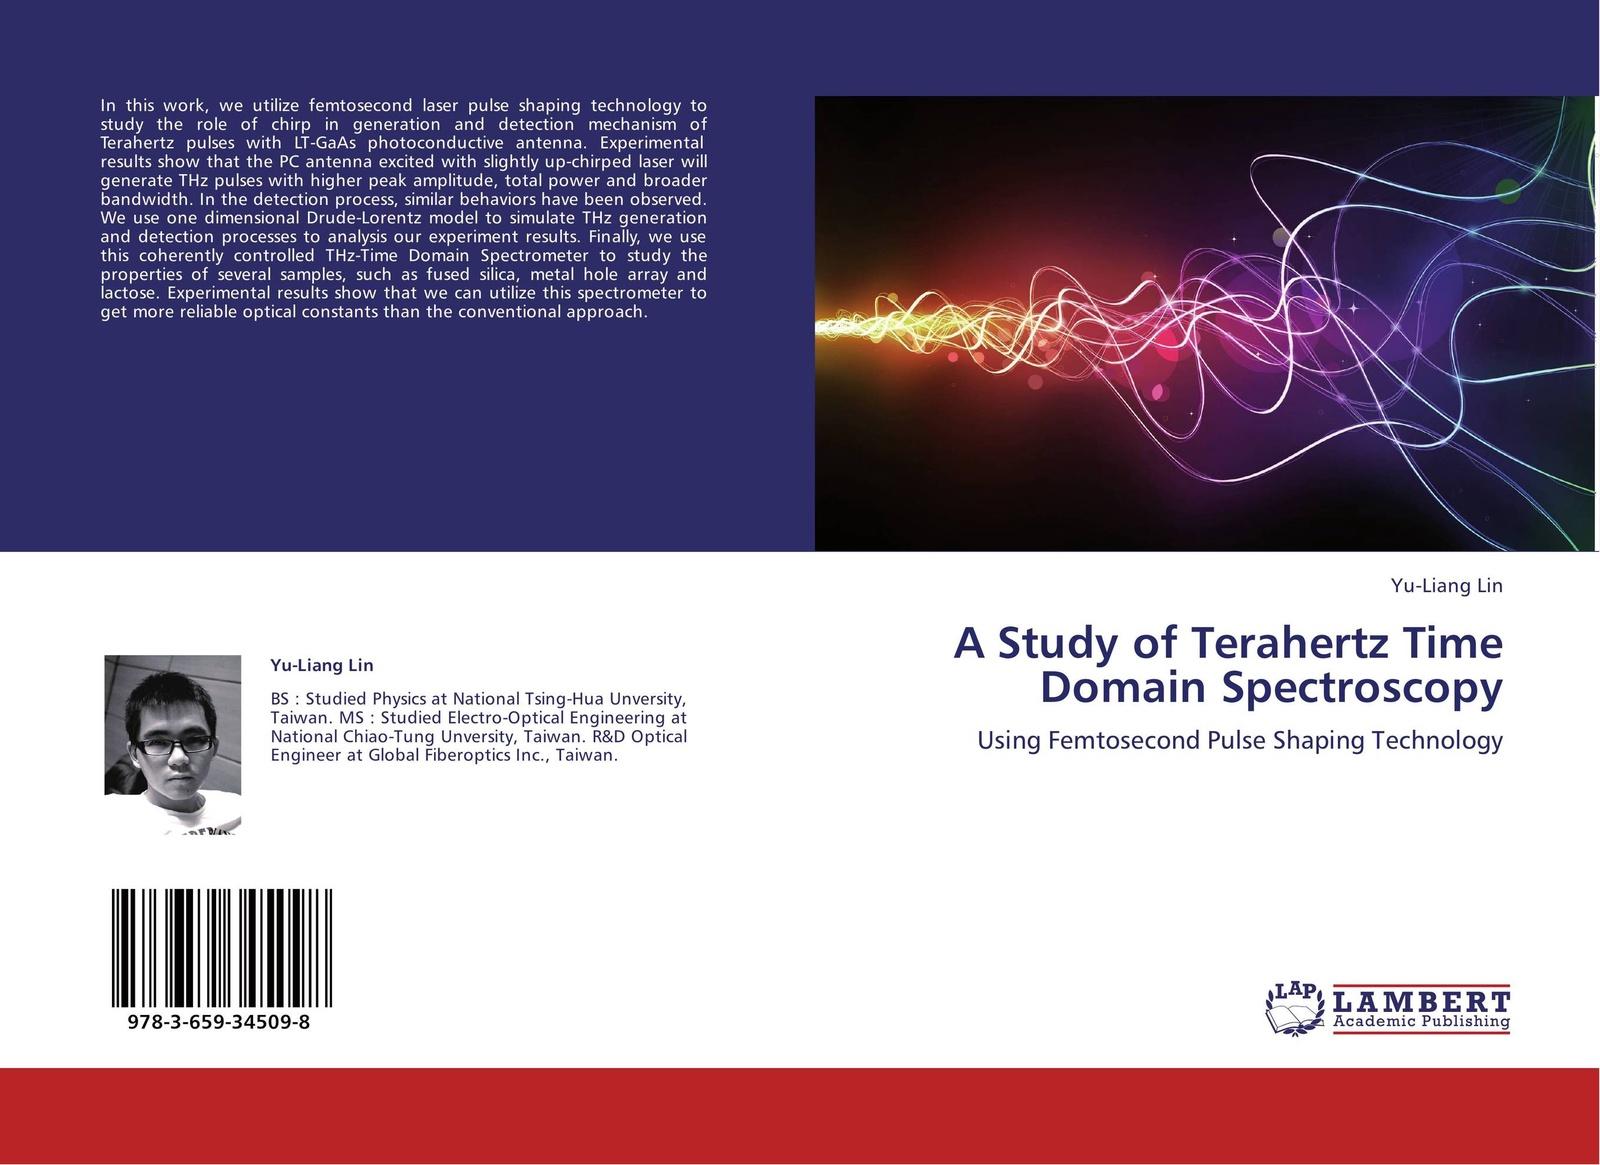 все цены на Yu-Liang Lin A Study of Terahertz Time Domain Spectroscopy онлайн